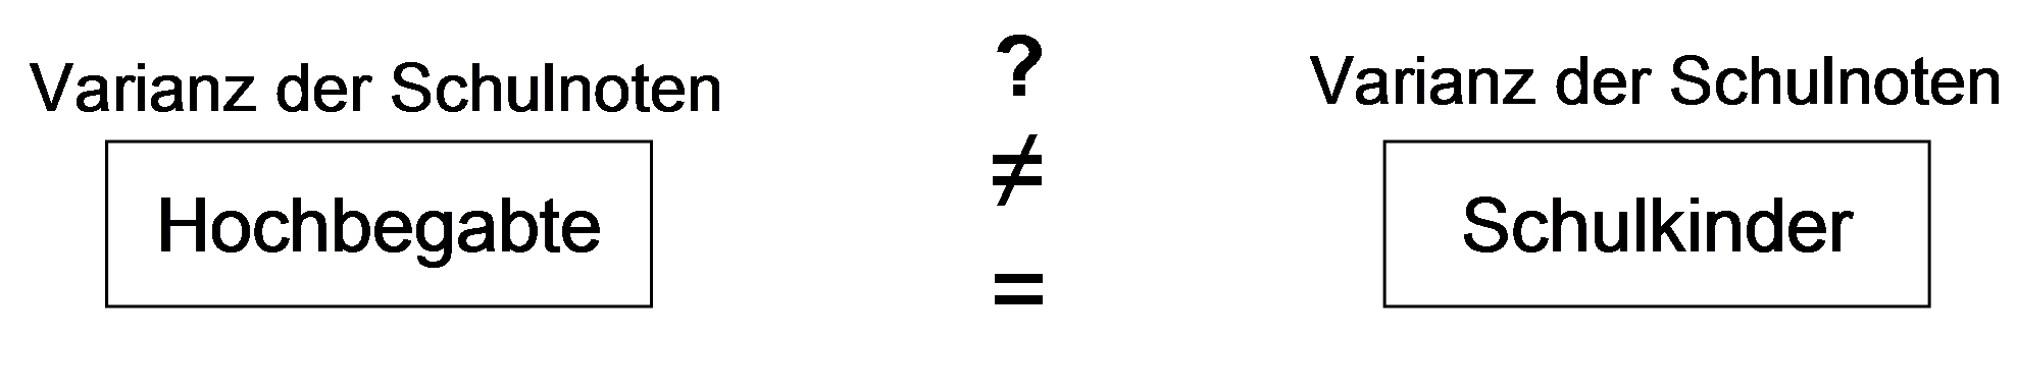 Abbildung 1: Beispiel Chi-Quadrat